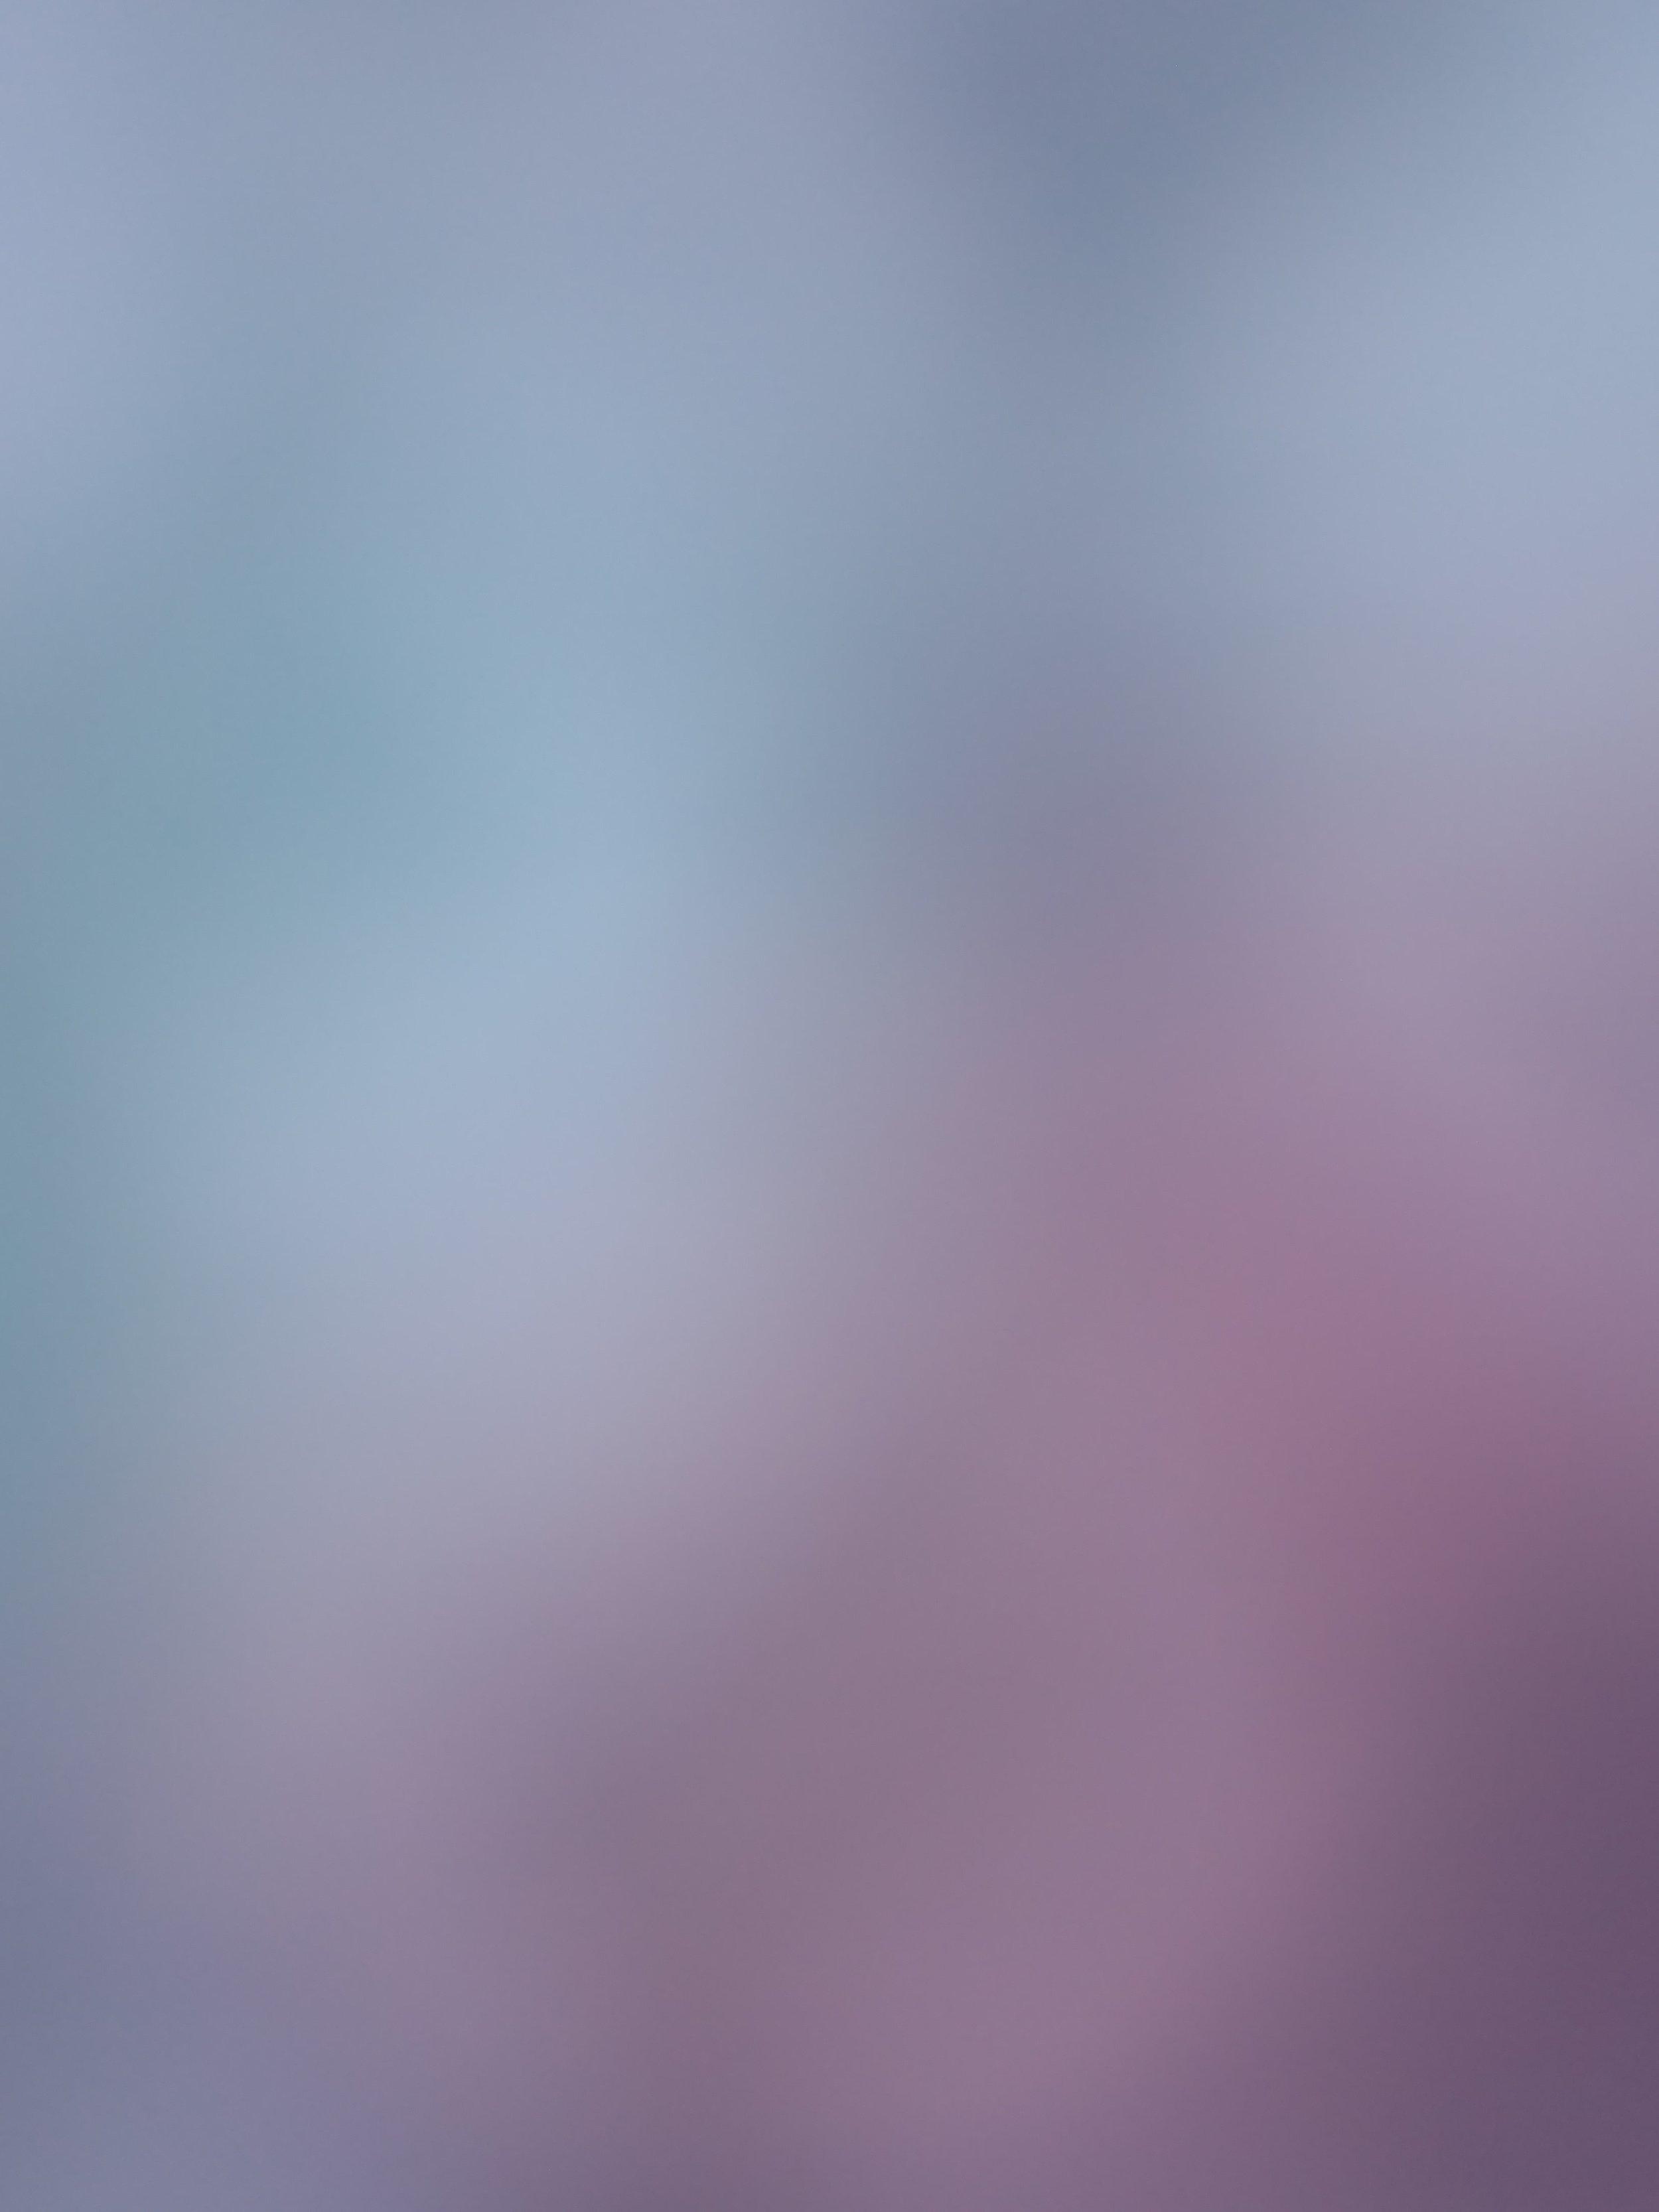 willroth-co-free-texture-gradient-006.jpg